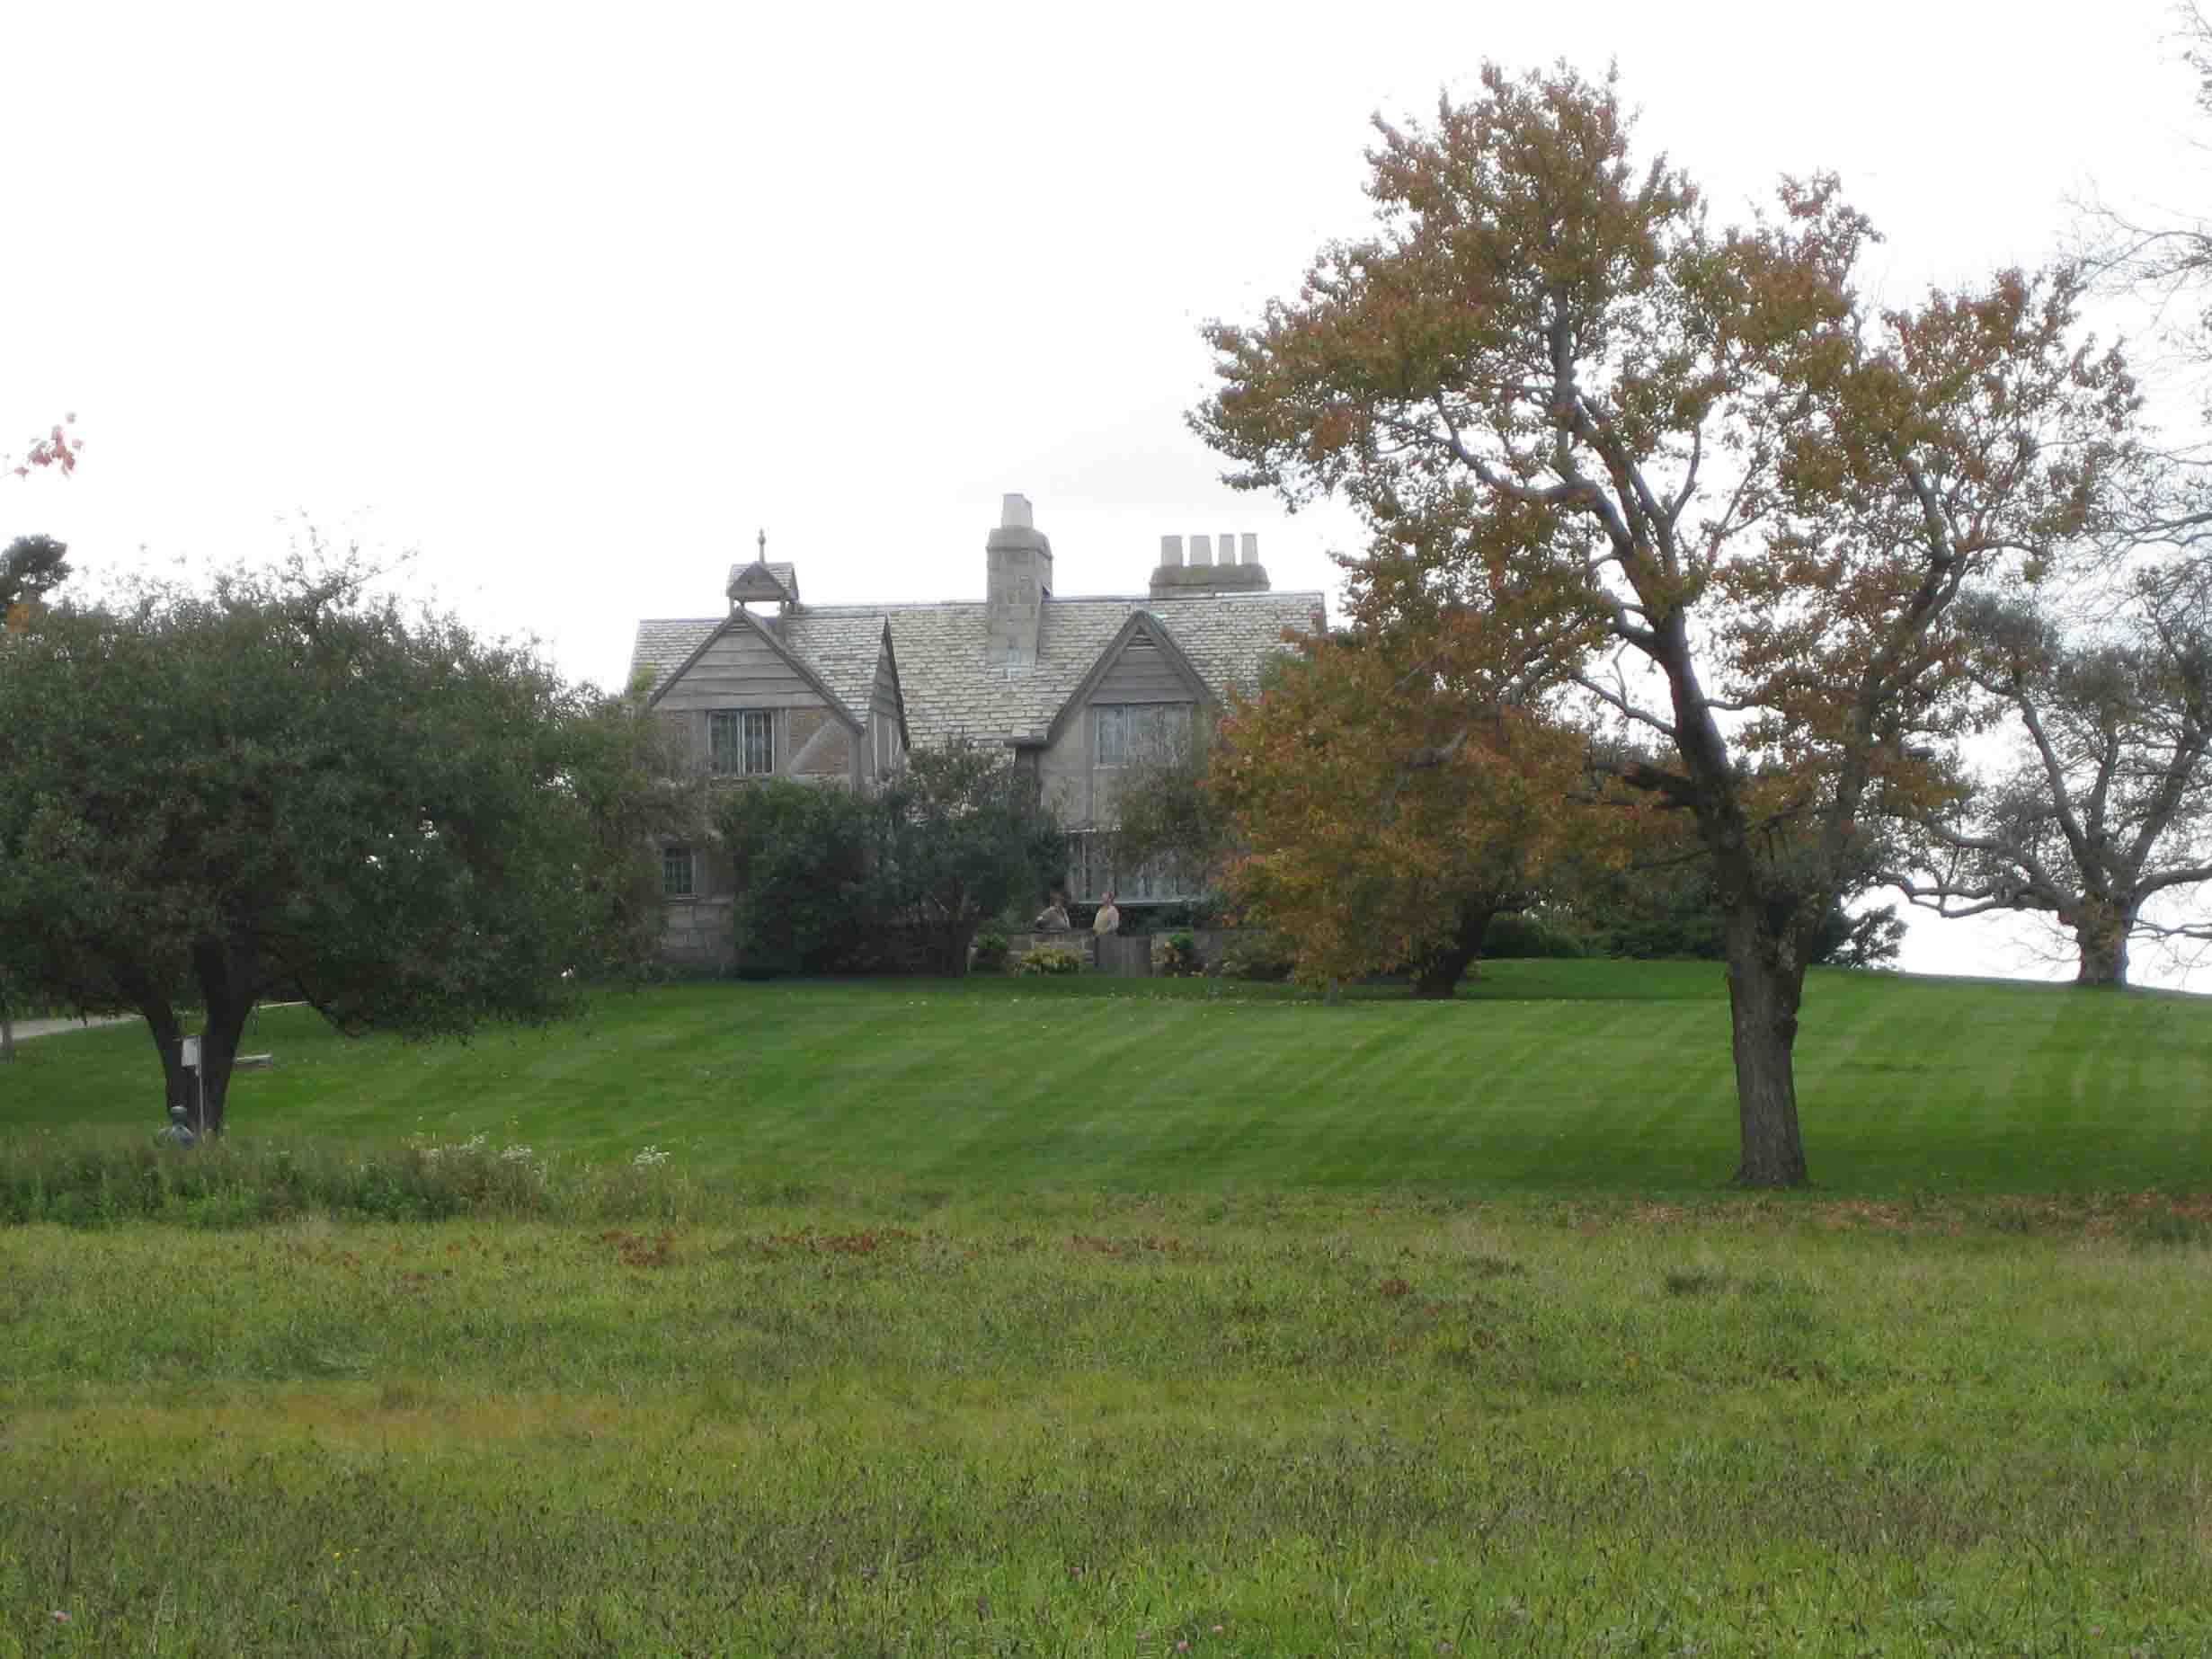 edith m mansion in the litchfield hills